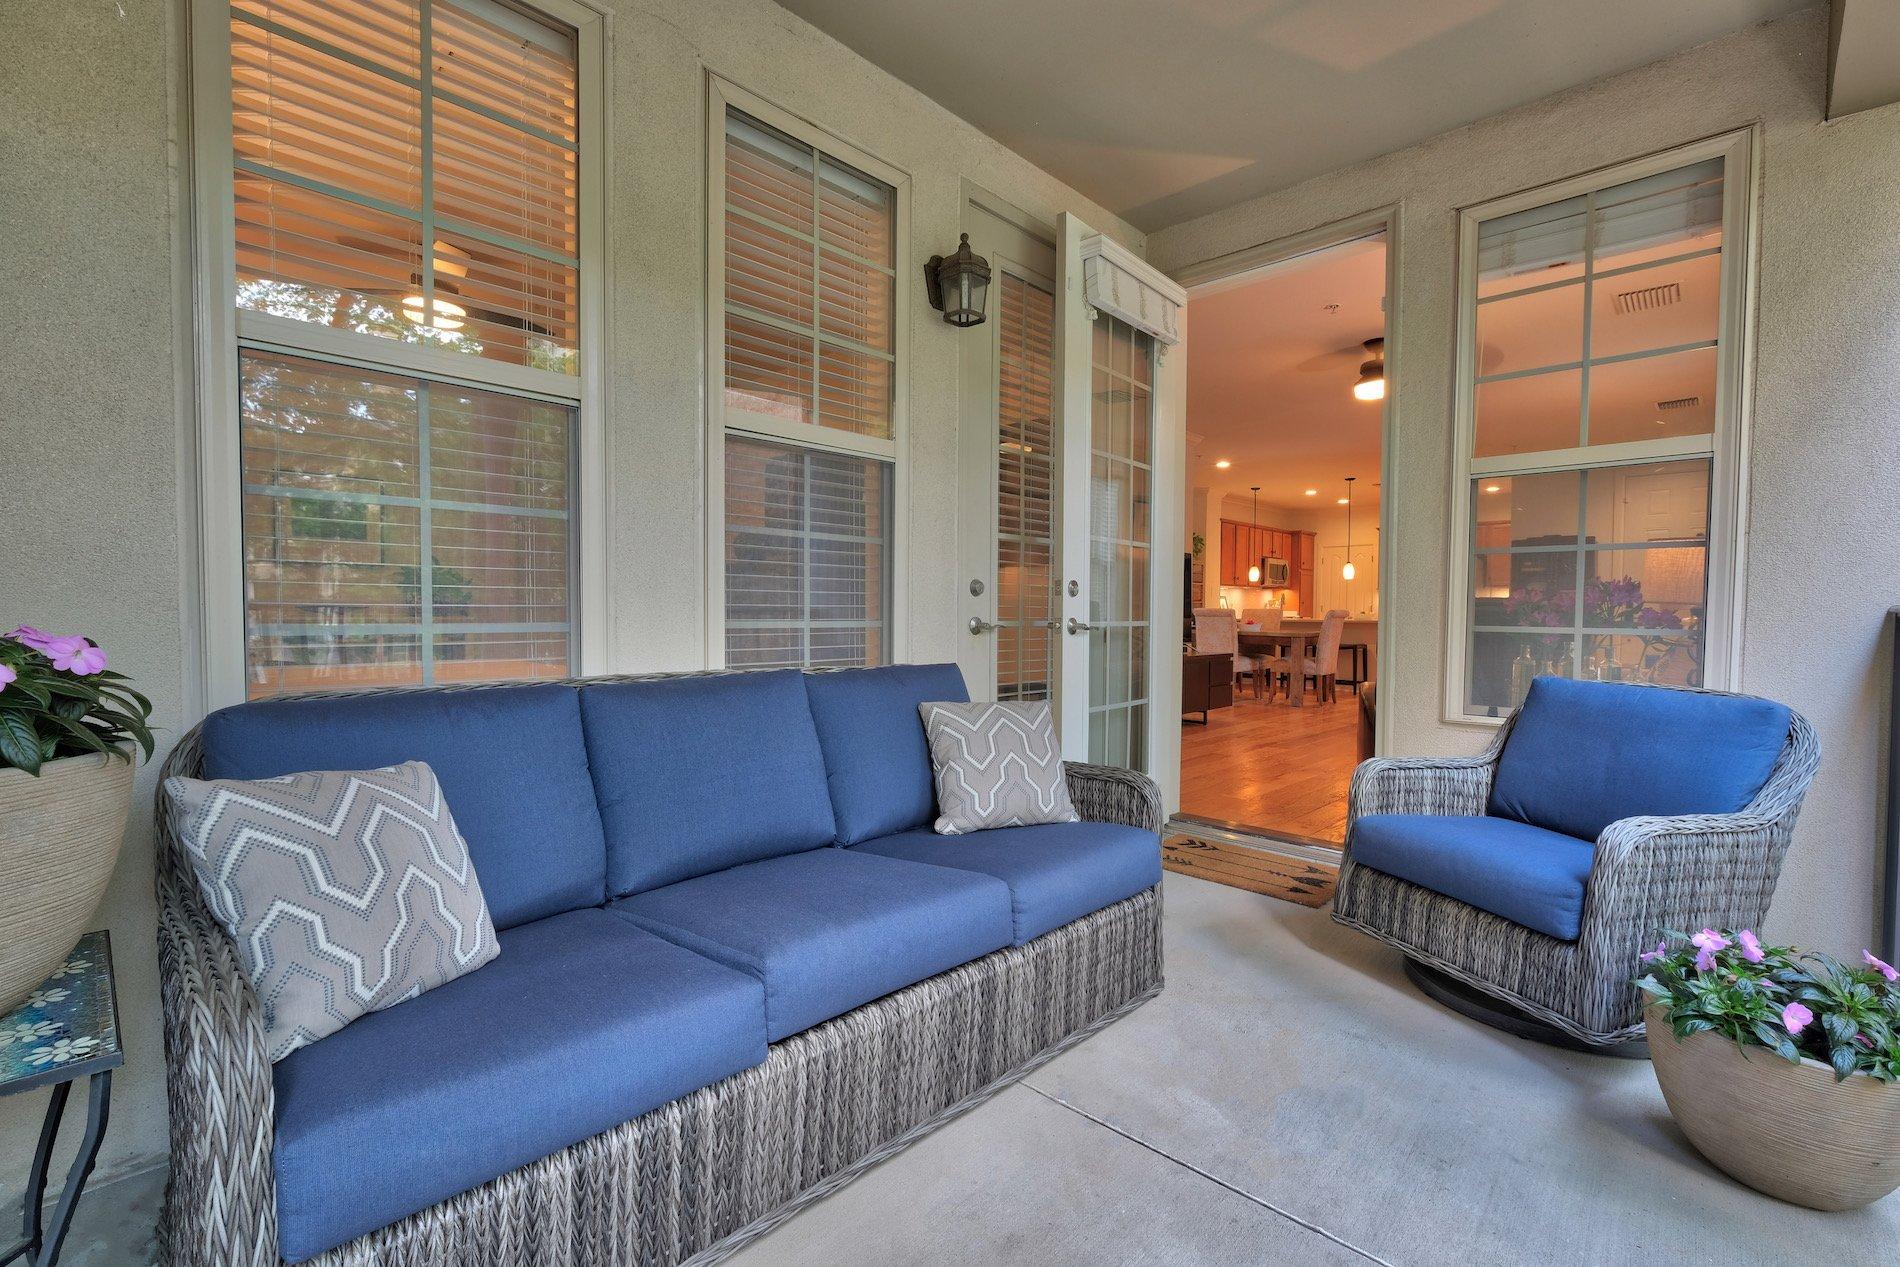 Covered porch, blue, wicker, patio furniture